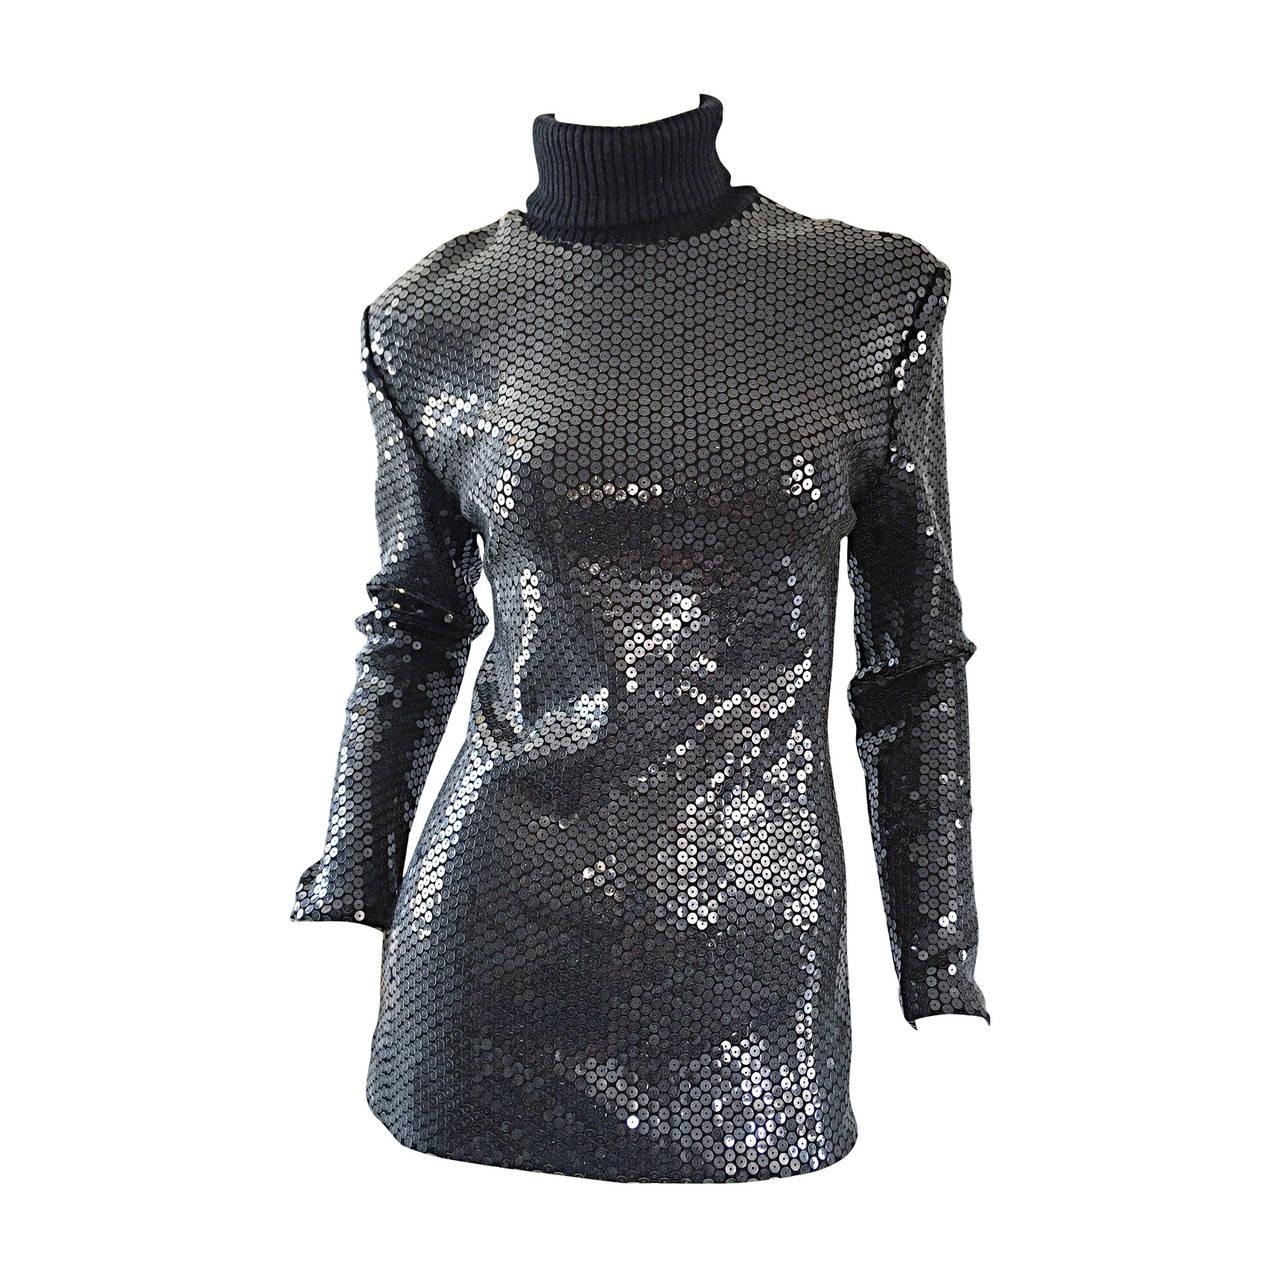 Rare Very Early Michael Kors Runway Sample Gray Sequins Turtleneck Sweater 1